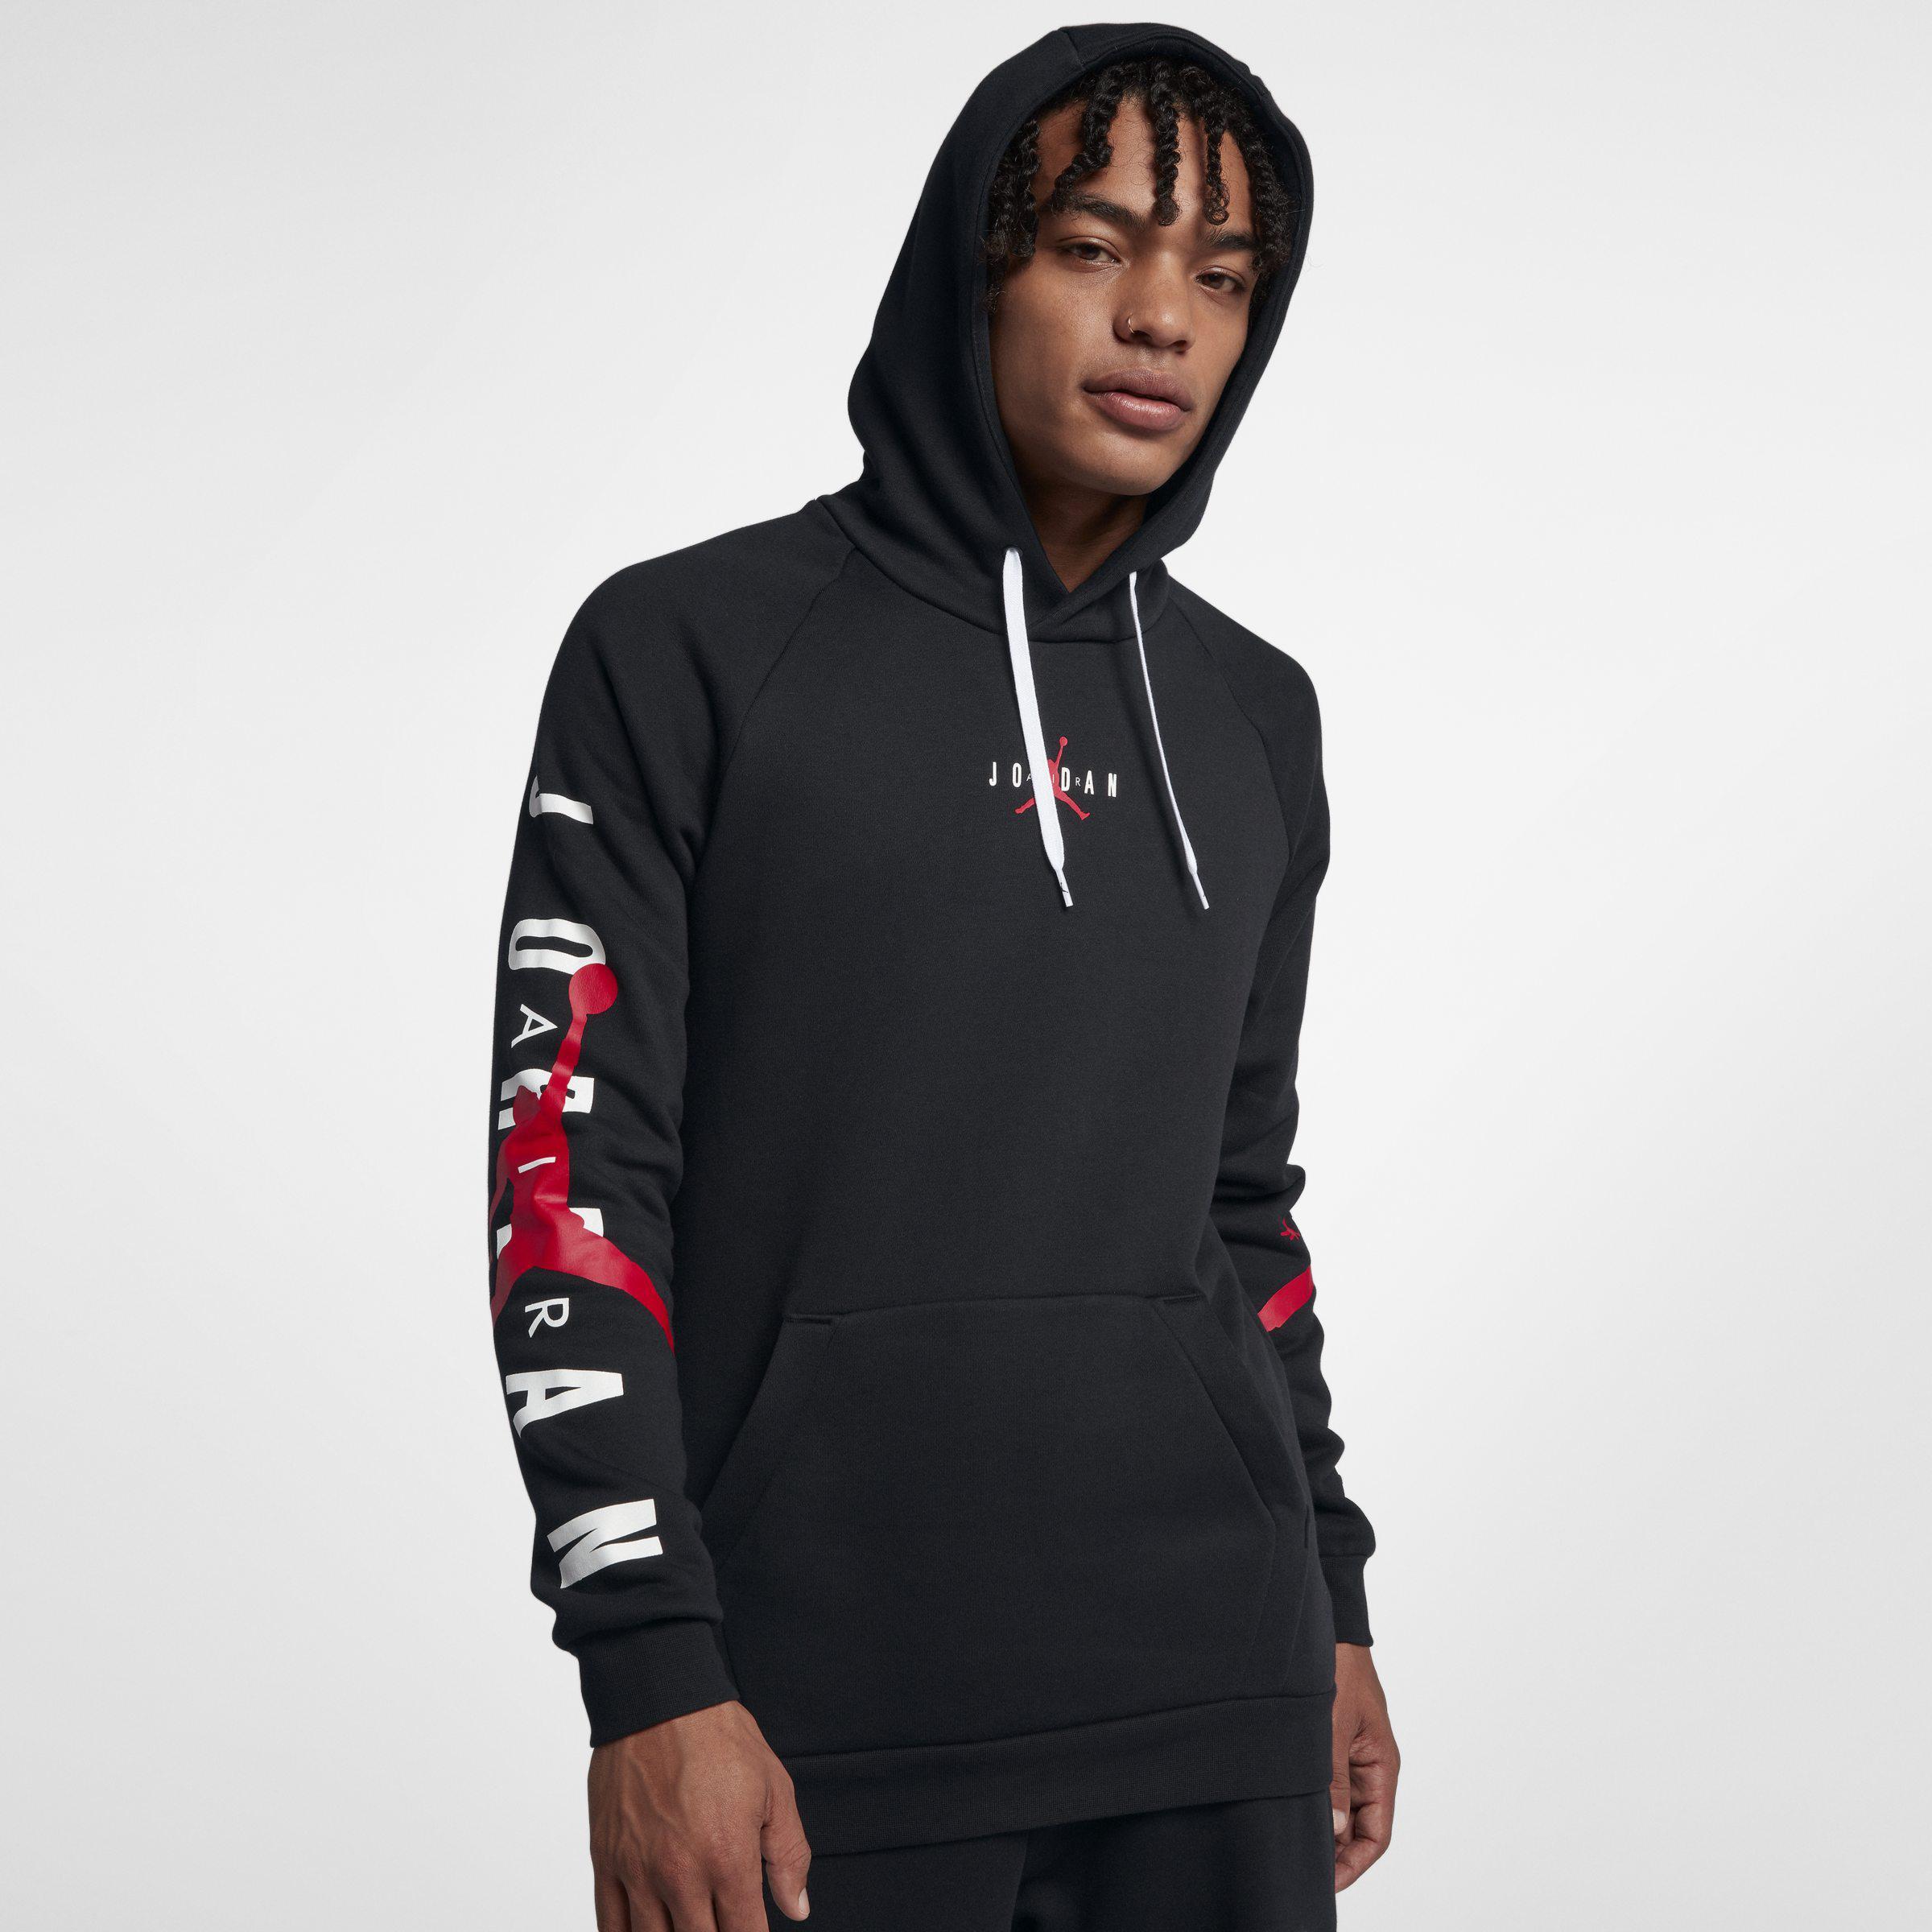 jordan sweatshirt black Sale,up to 72